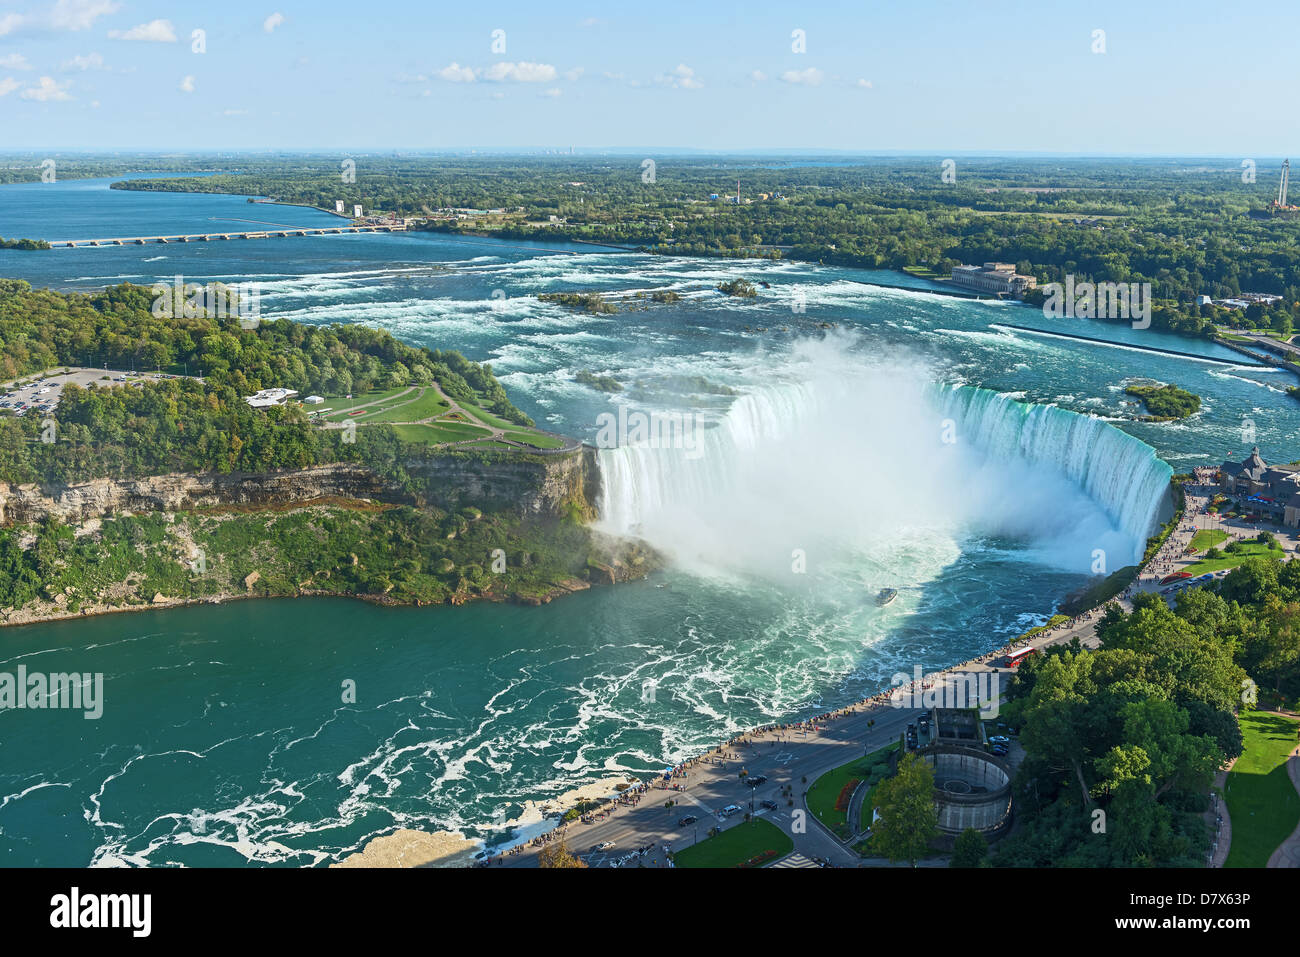 Niagara Falls aerial view from Skylon Tower platforms - Stock Image